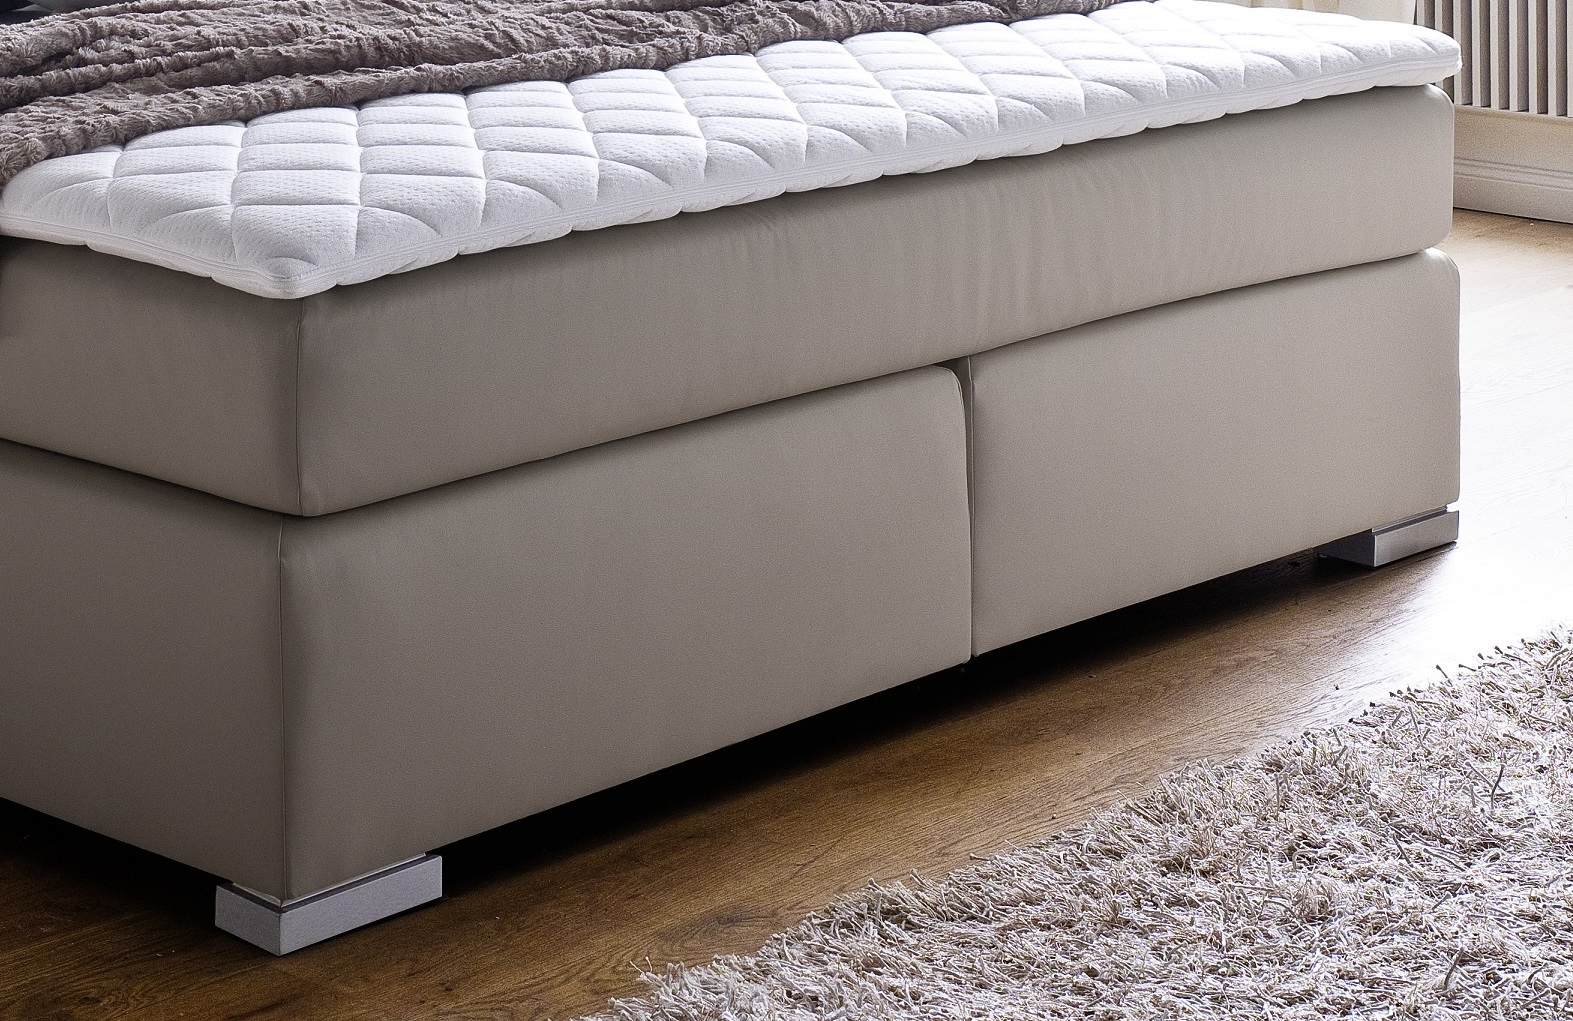 boxspringbett isabelle muddy 200cm x 200cm. Black Bedroom Furniture Sets. Home Design Ideas